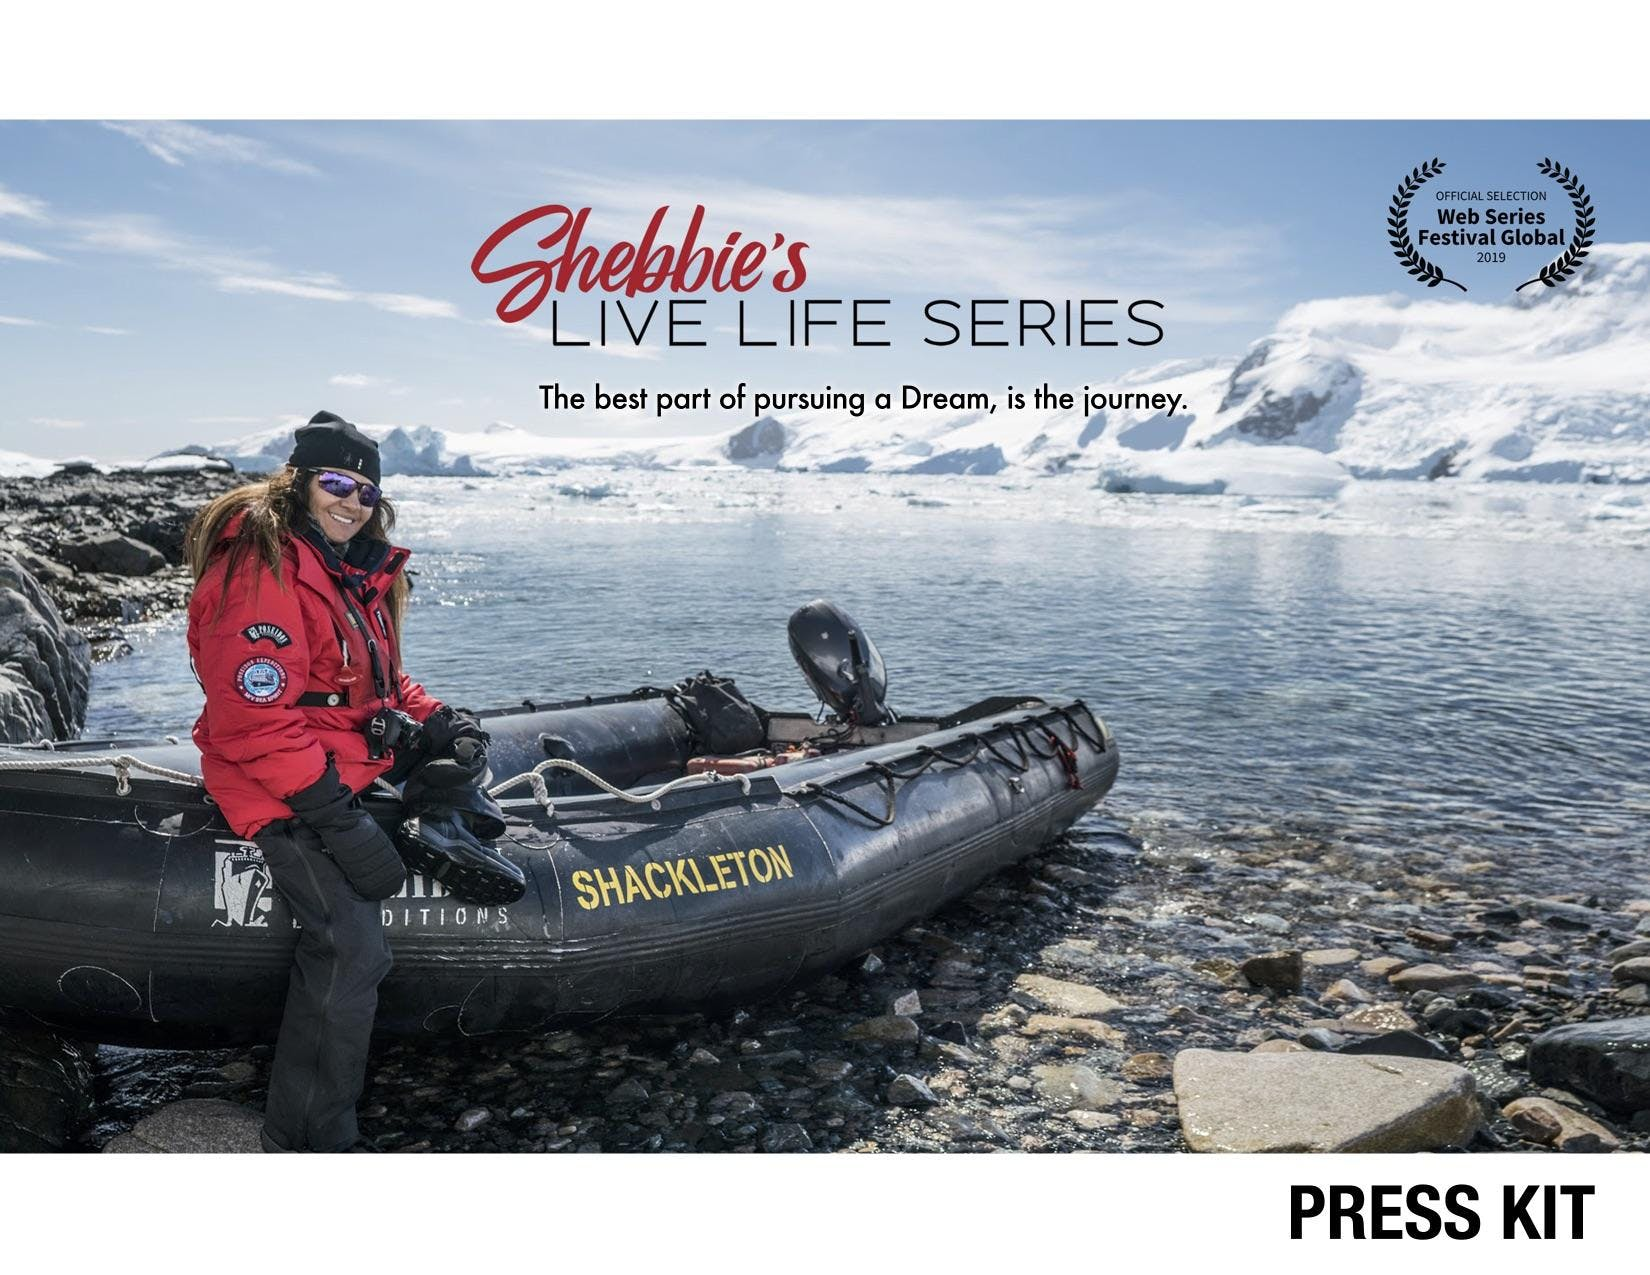 Shebbie's Live Life Series Premiere